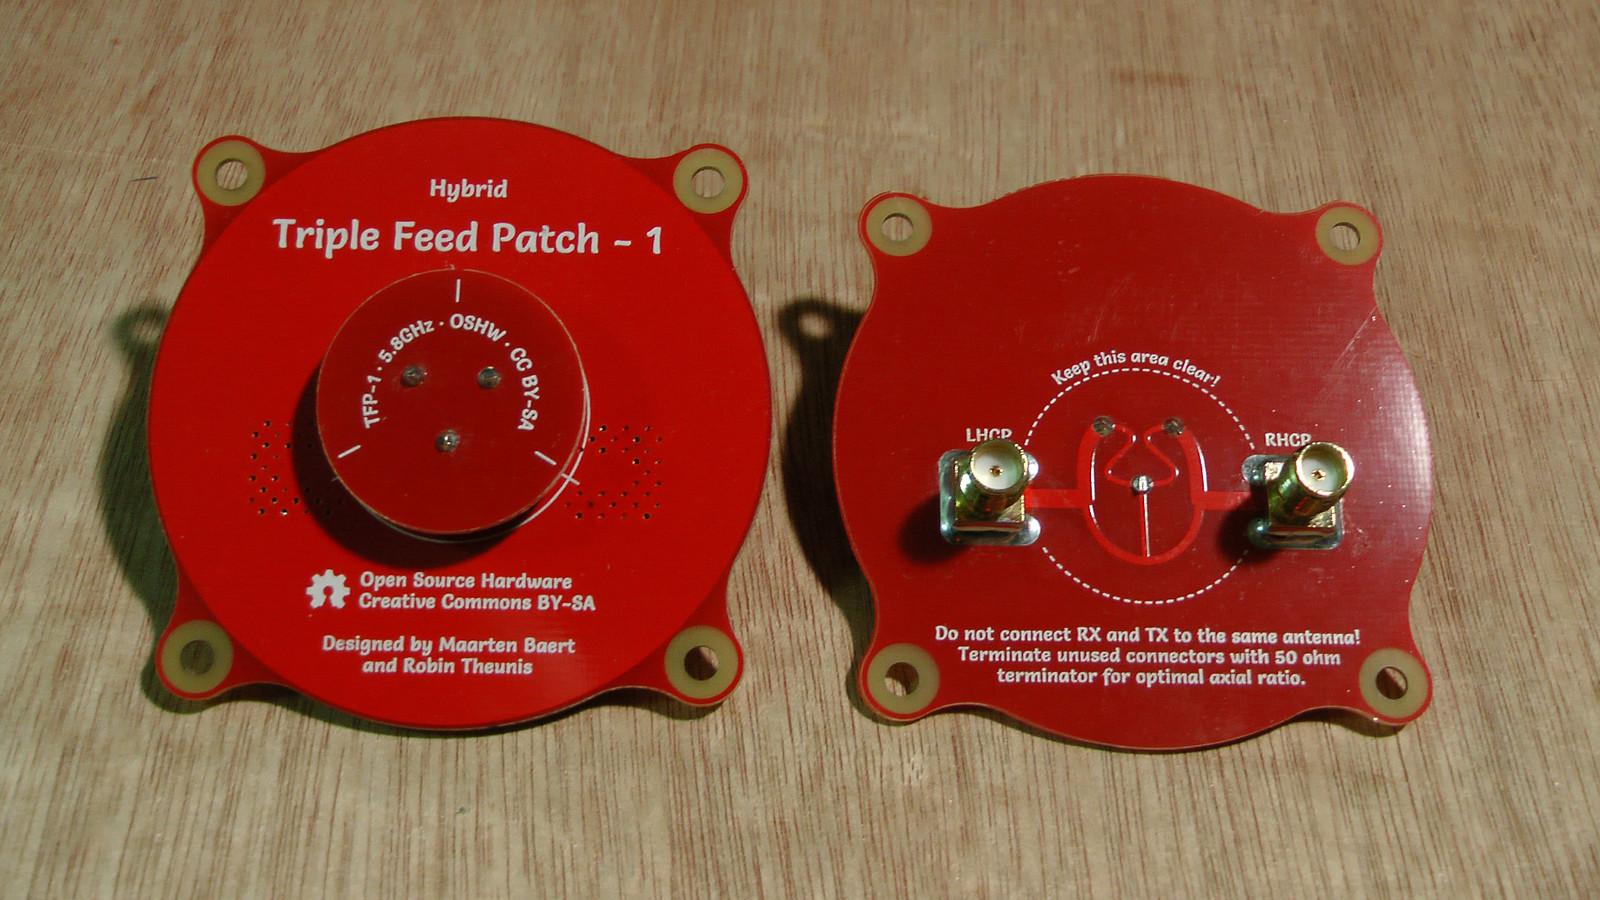 Triple Feed Patch Antenna Quadcopters Maarten Baerts Website Design Calculator Circuit For